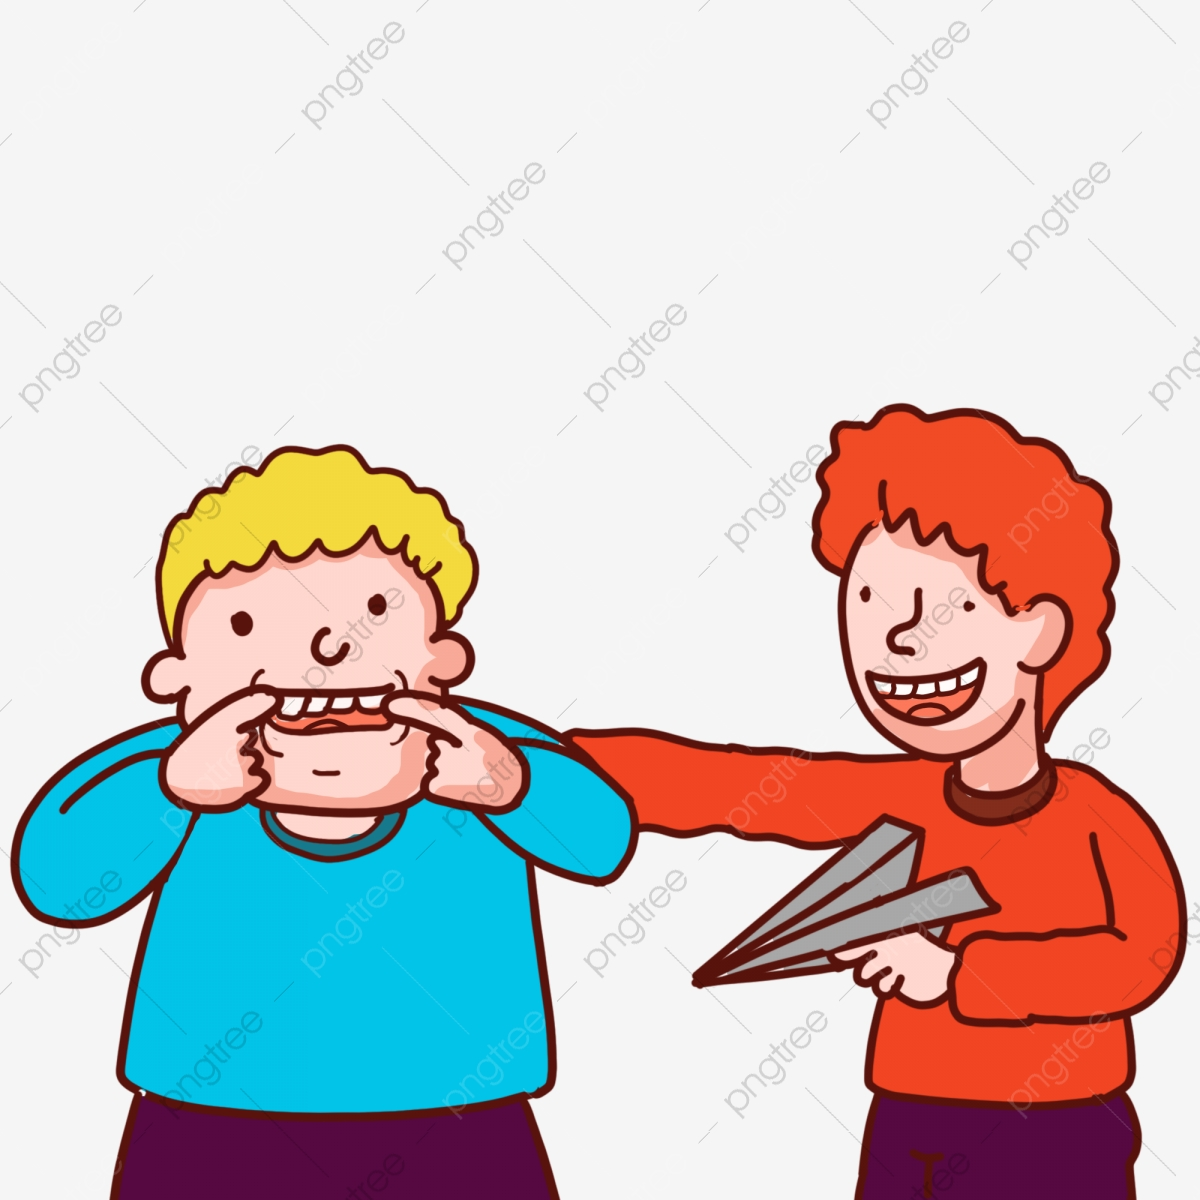 Funny Cartoon Images Of Boys playmate cartoon kid grimacing little boy boys playing